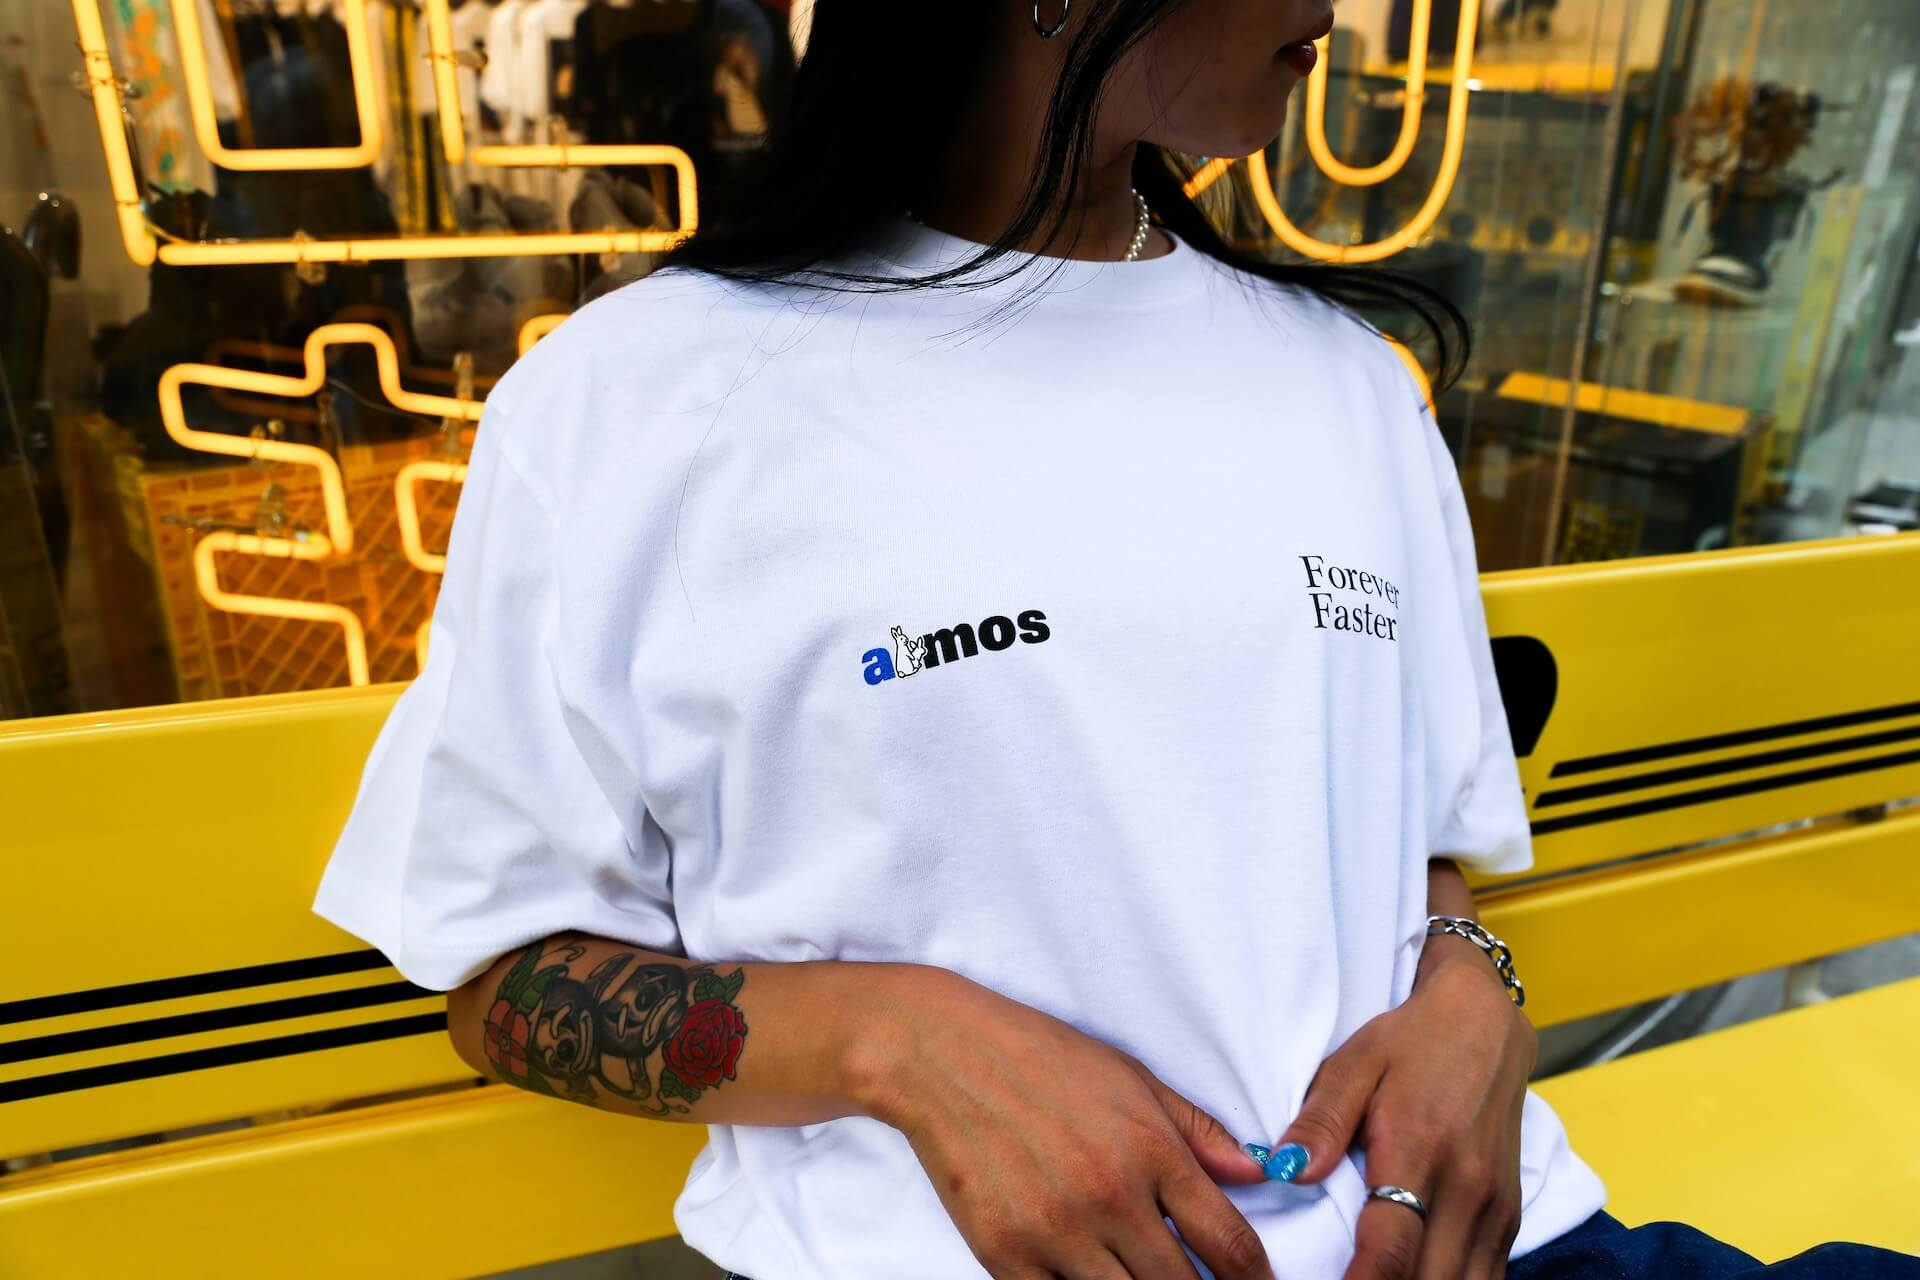 atmosの恒例企画<偏愛Vol.3>が開催決定!#FR2、HohokamDINER、THREE TIDES TATTOOとコラボしたPUMA SUEDEが発売 life210625_atmos_puma_15